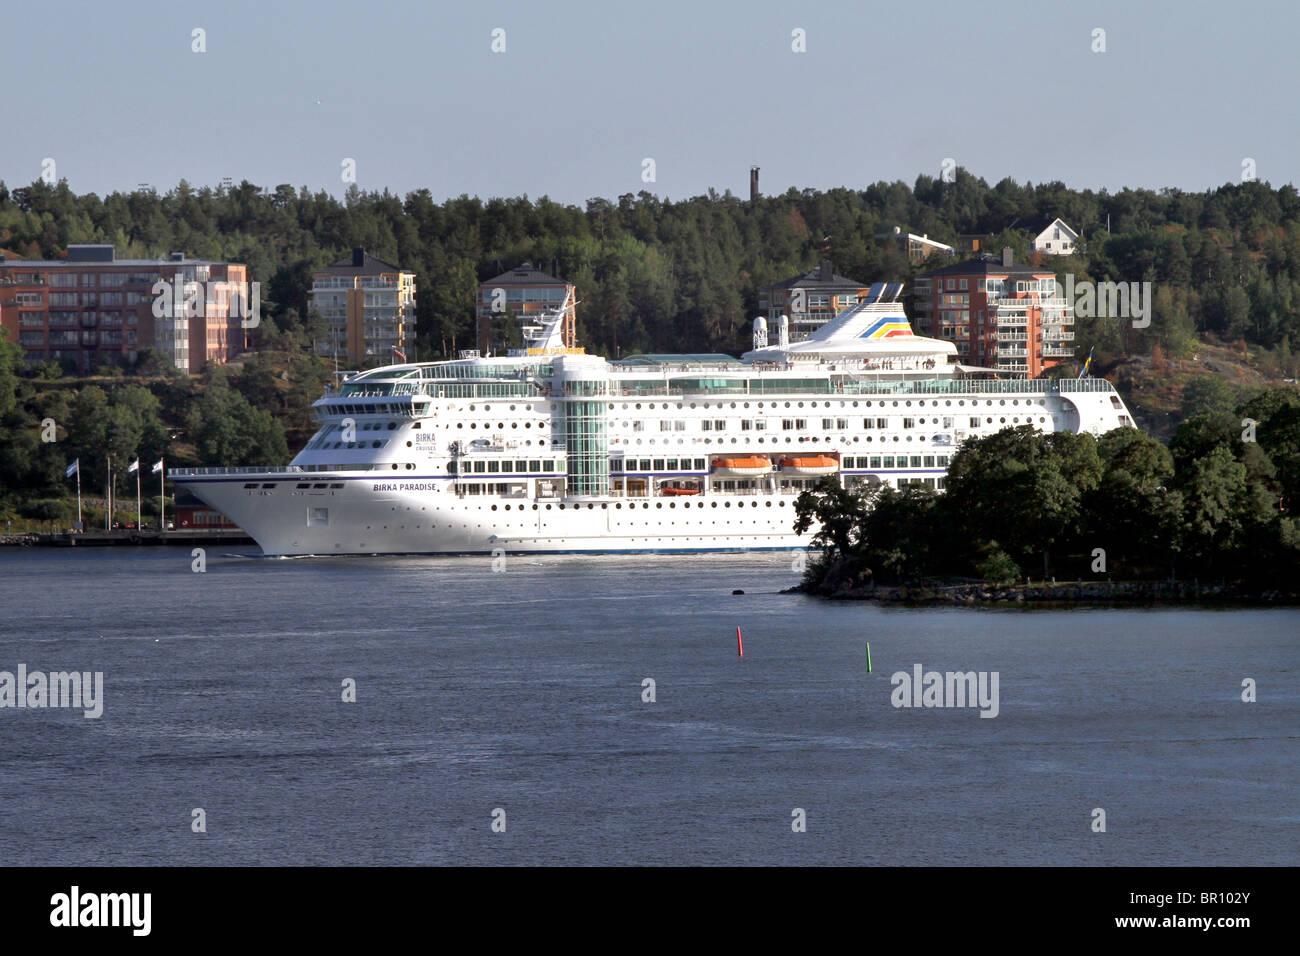 Birka Paradise Cruise Ship in the Stockholm Archipelago in Stockholm, Sweden Stock Photo